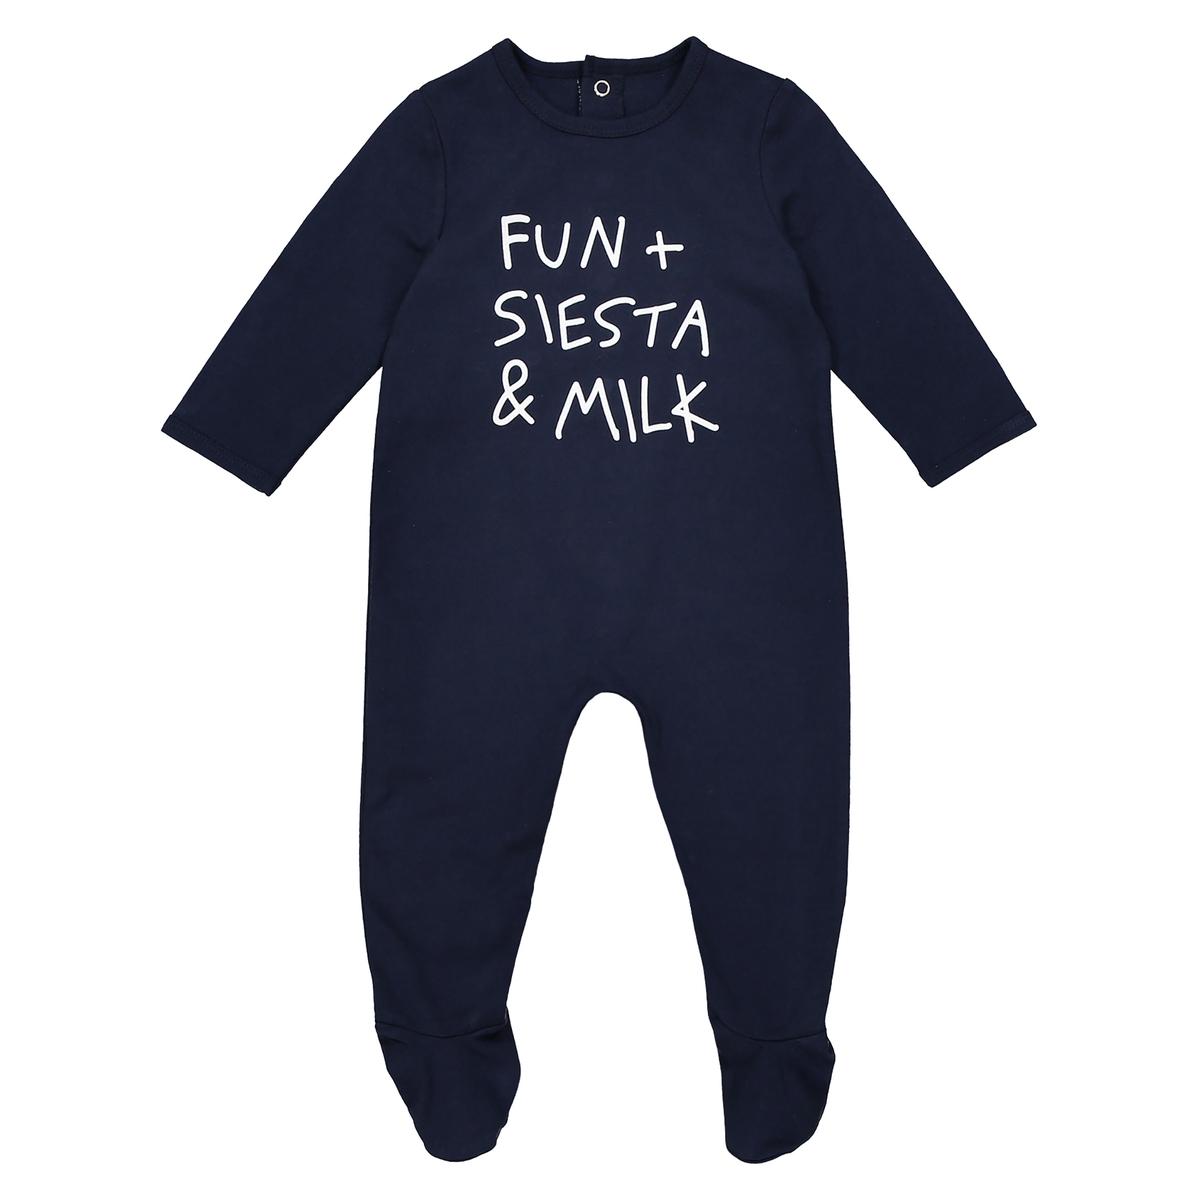 Пижама с застежкой на кнопки, 0 мес. - 3 года, знак Oeko Tex